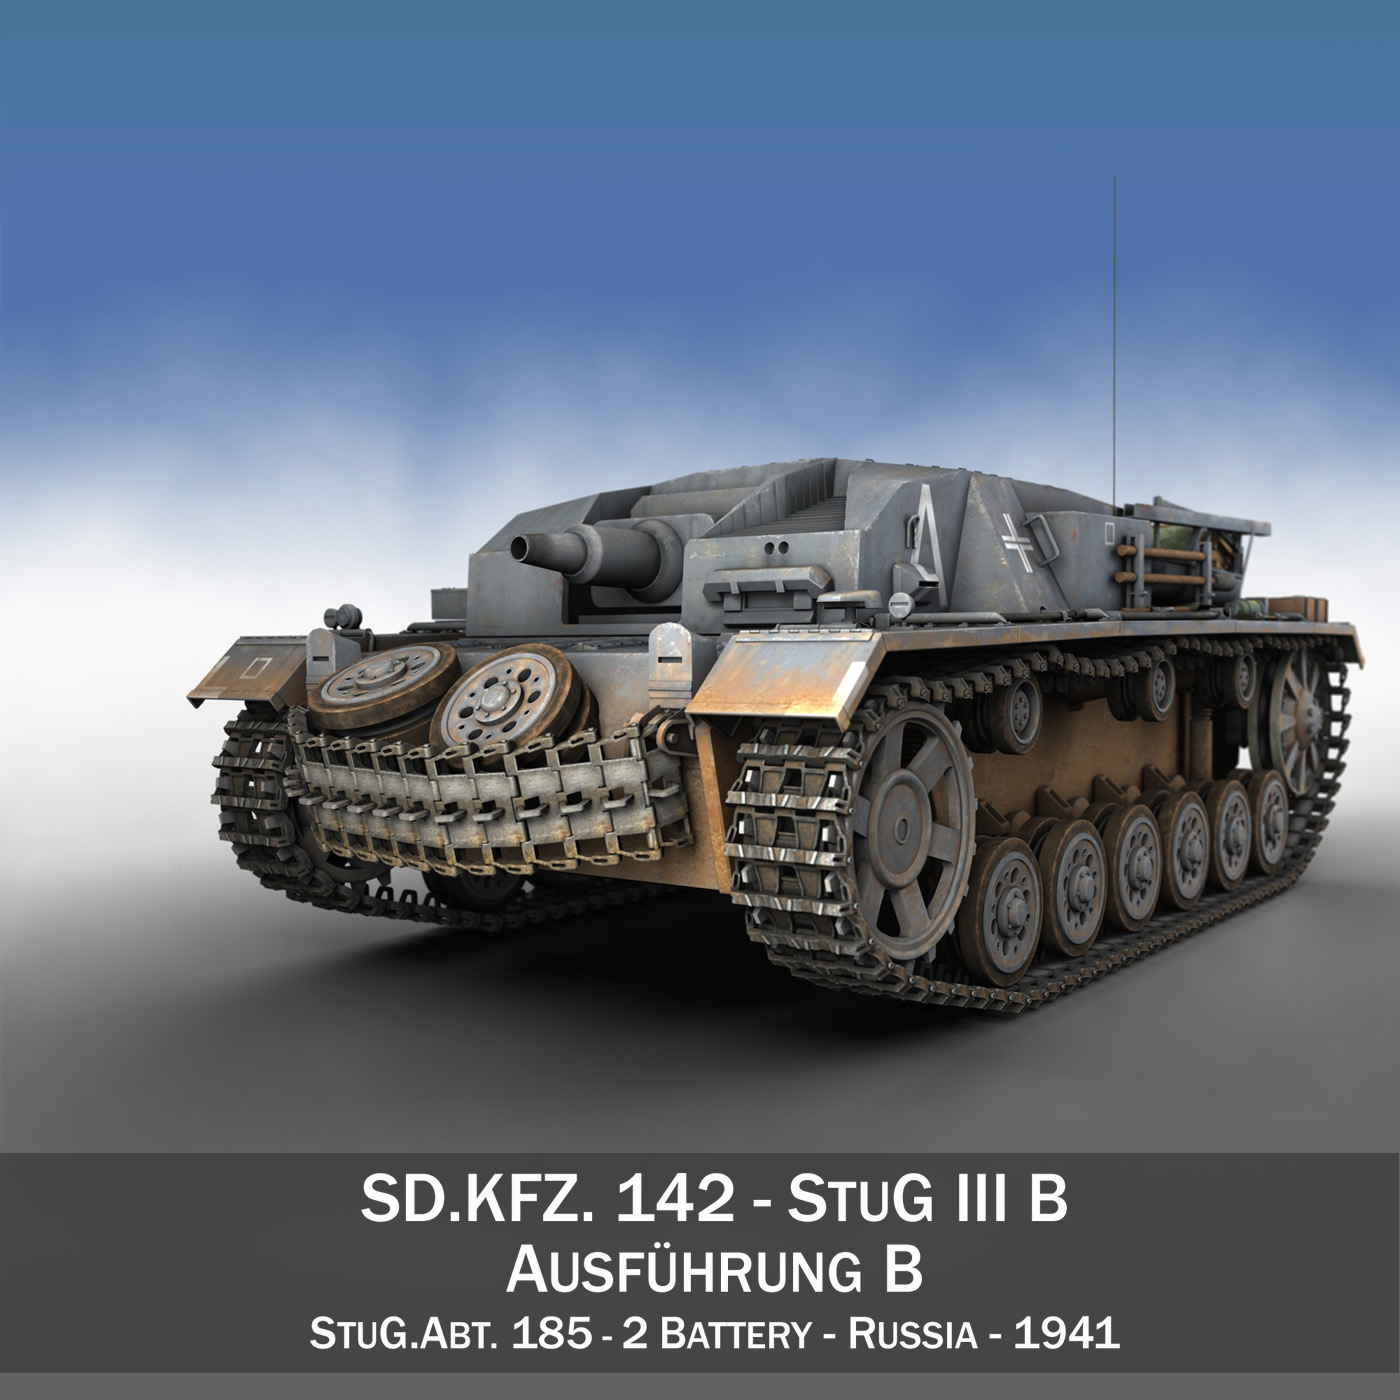 stug iii – ausf.b – stug.abt. 185 3d model 3ds fbx c4d lwo obj 196938